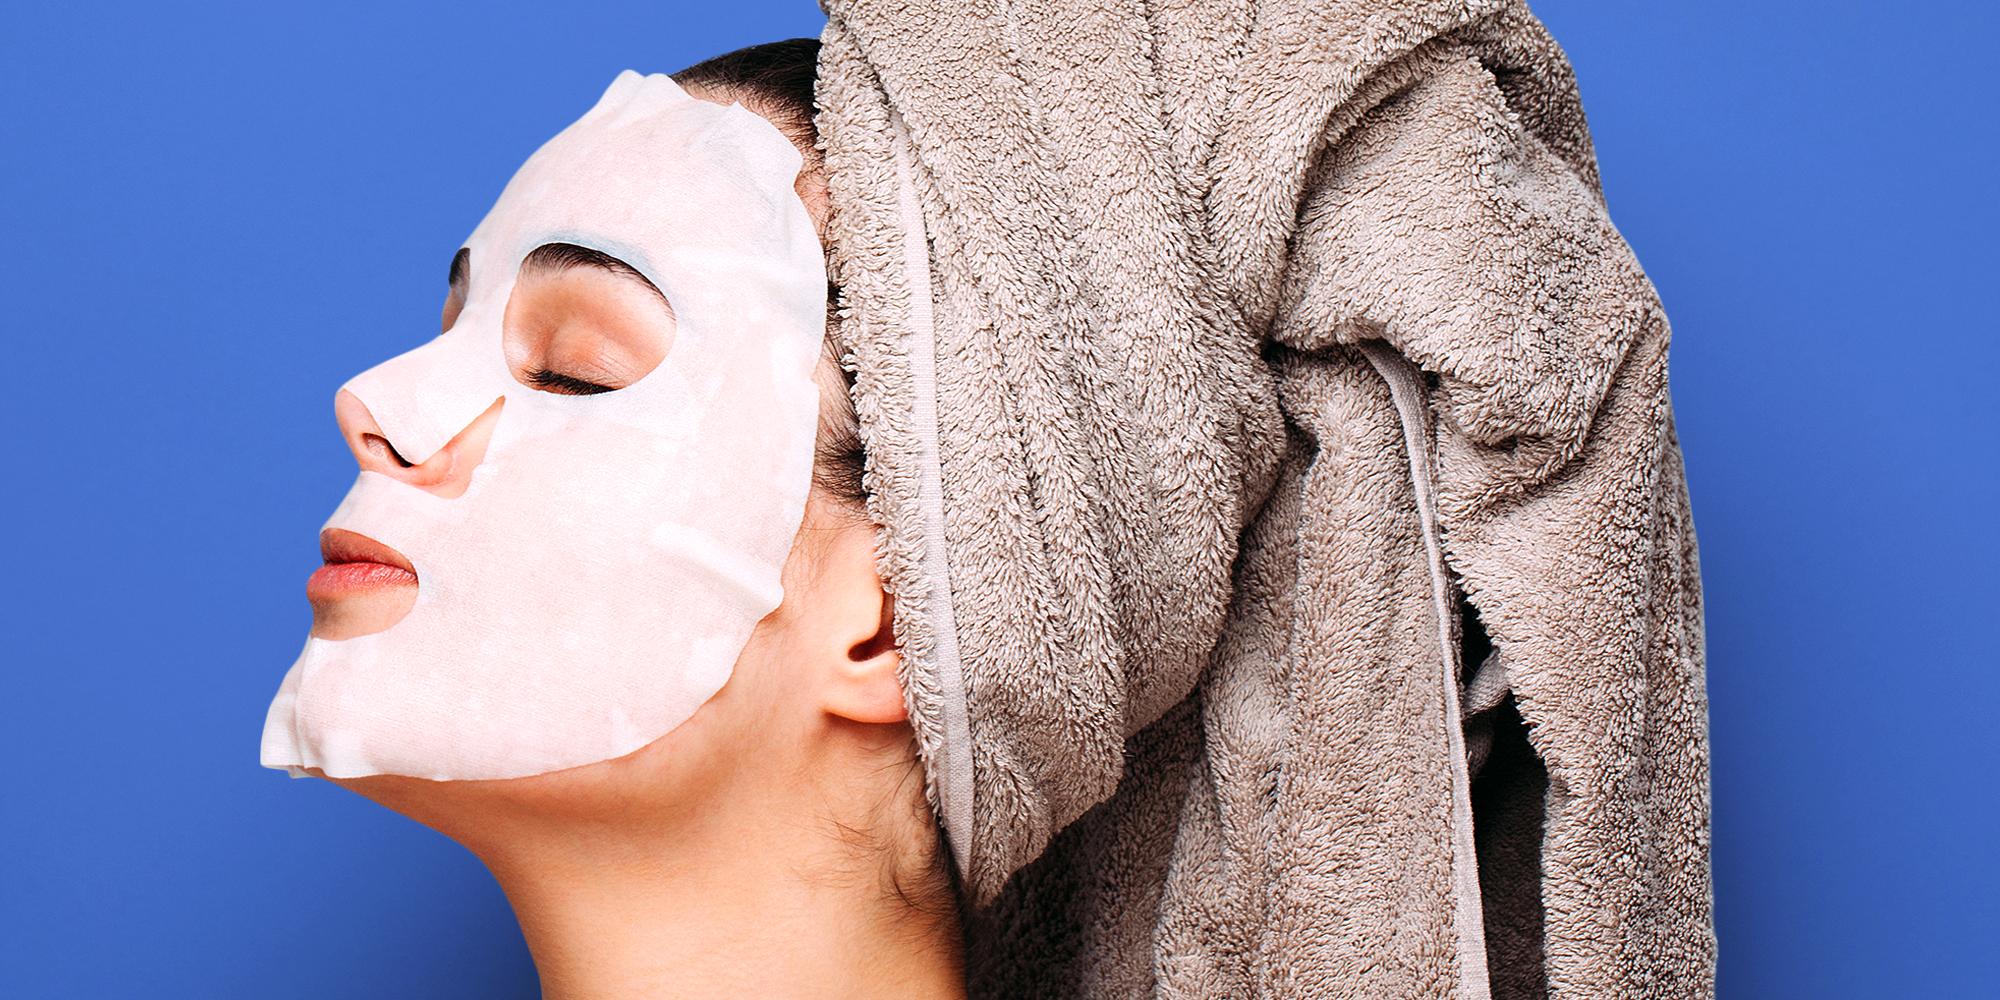 15 Best Sheet Masks for Your Face - Firming & Hydrating Sheet Masks